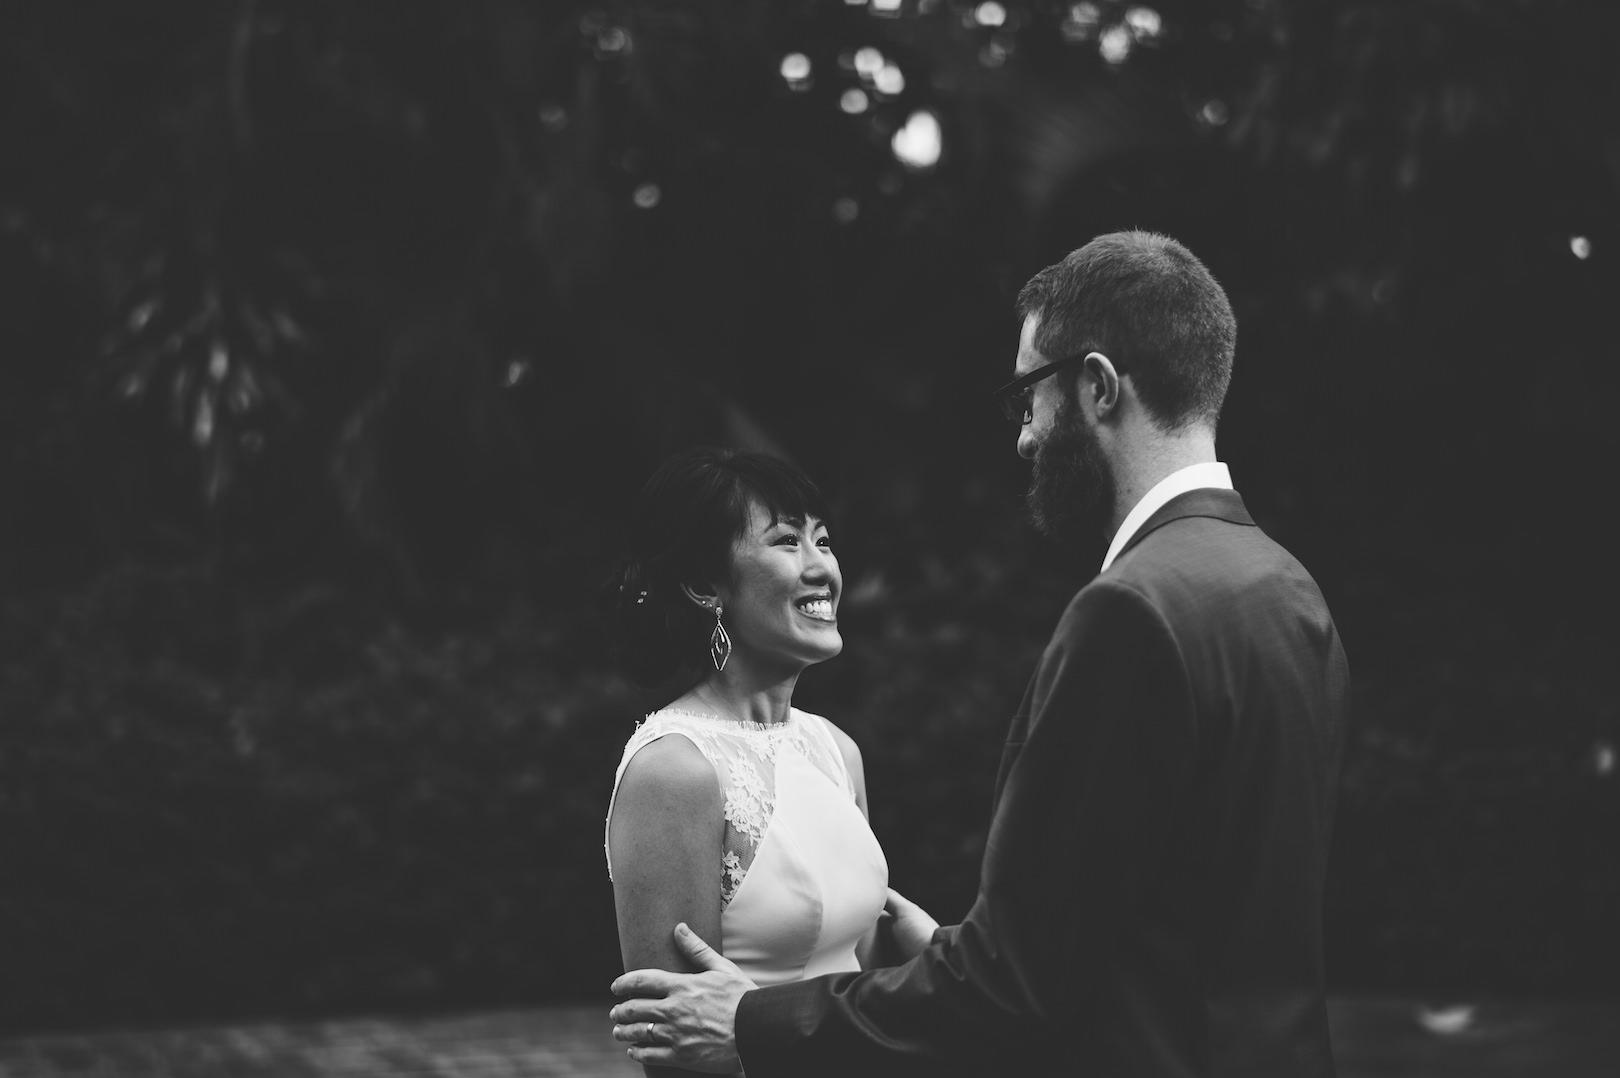 Nathan & Felicia - Wedding Day - © Dallas Kolotylo Photography - 286